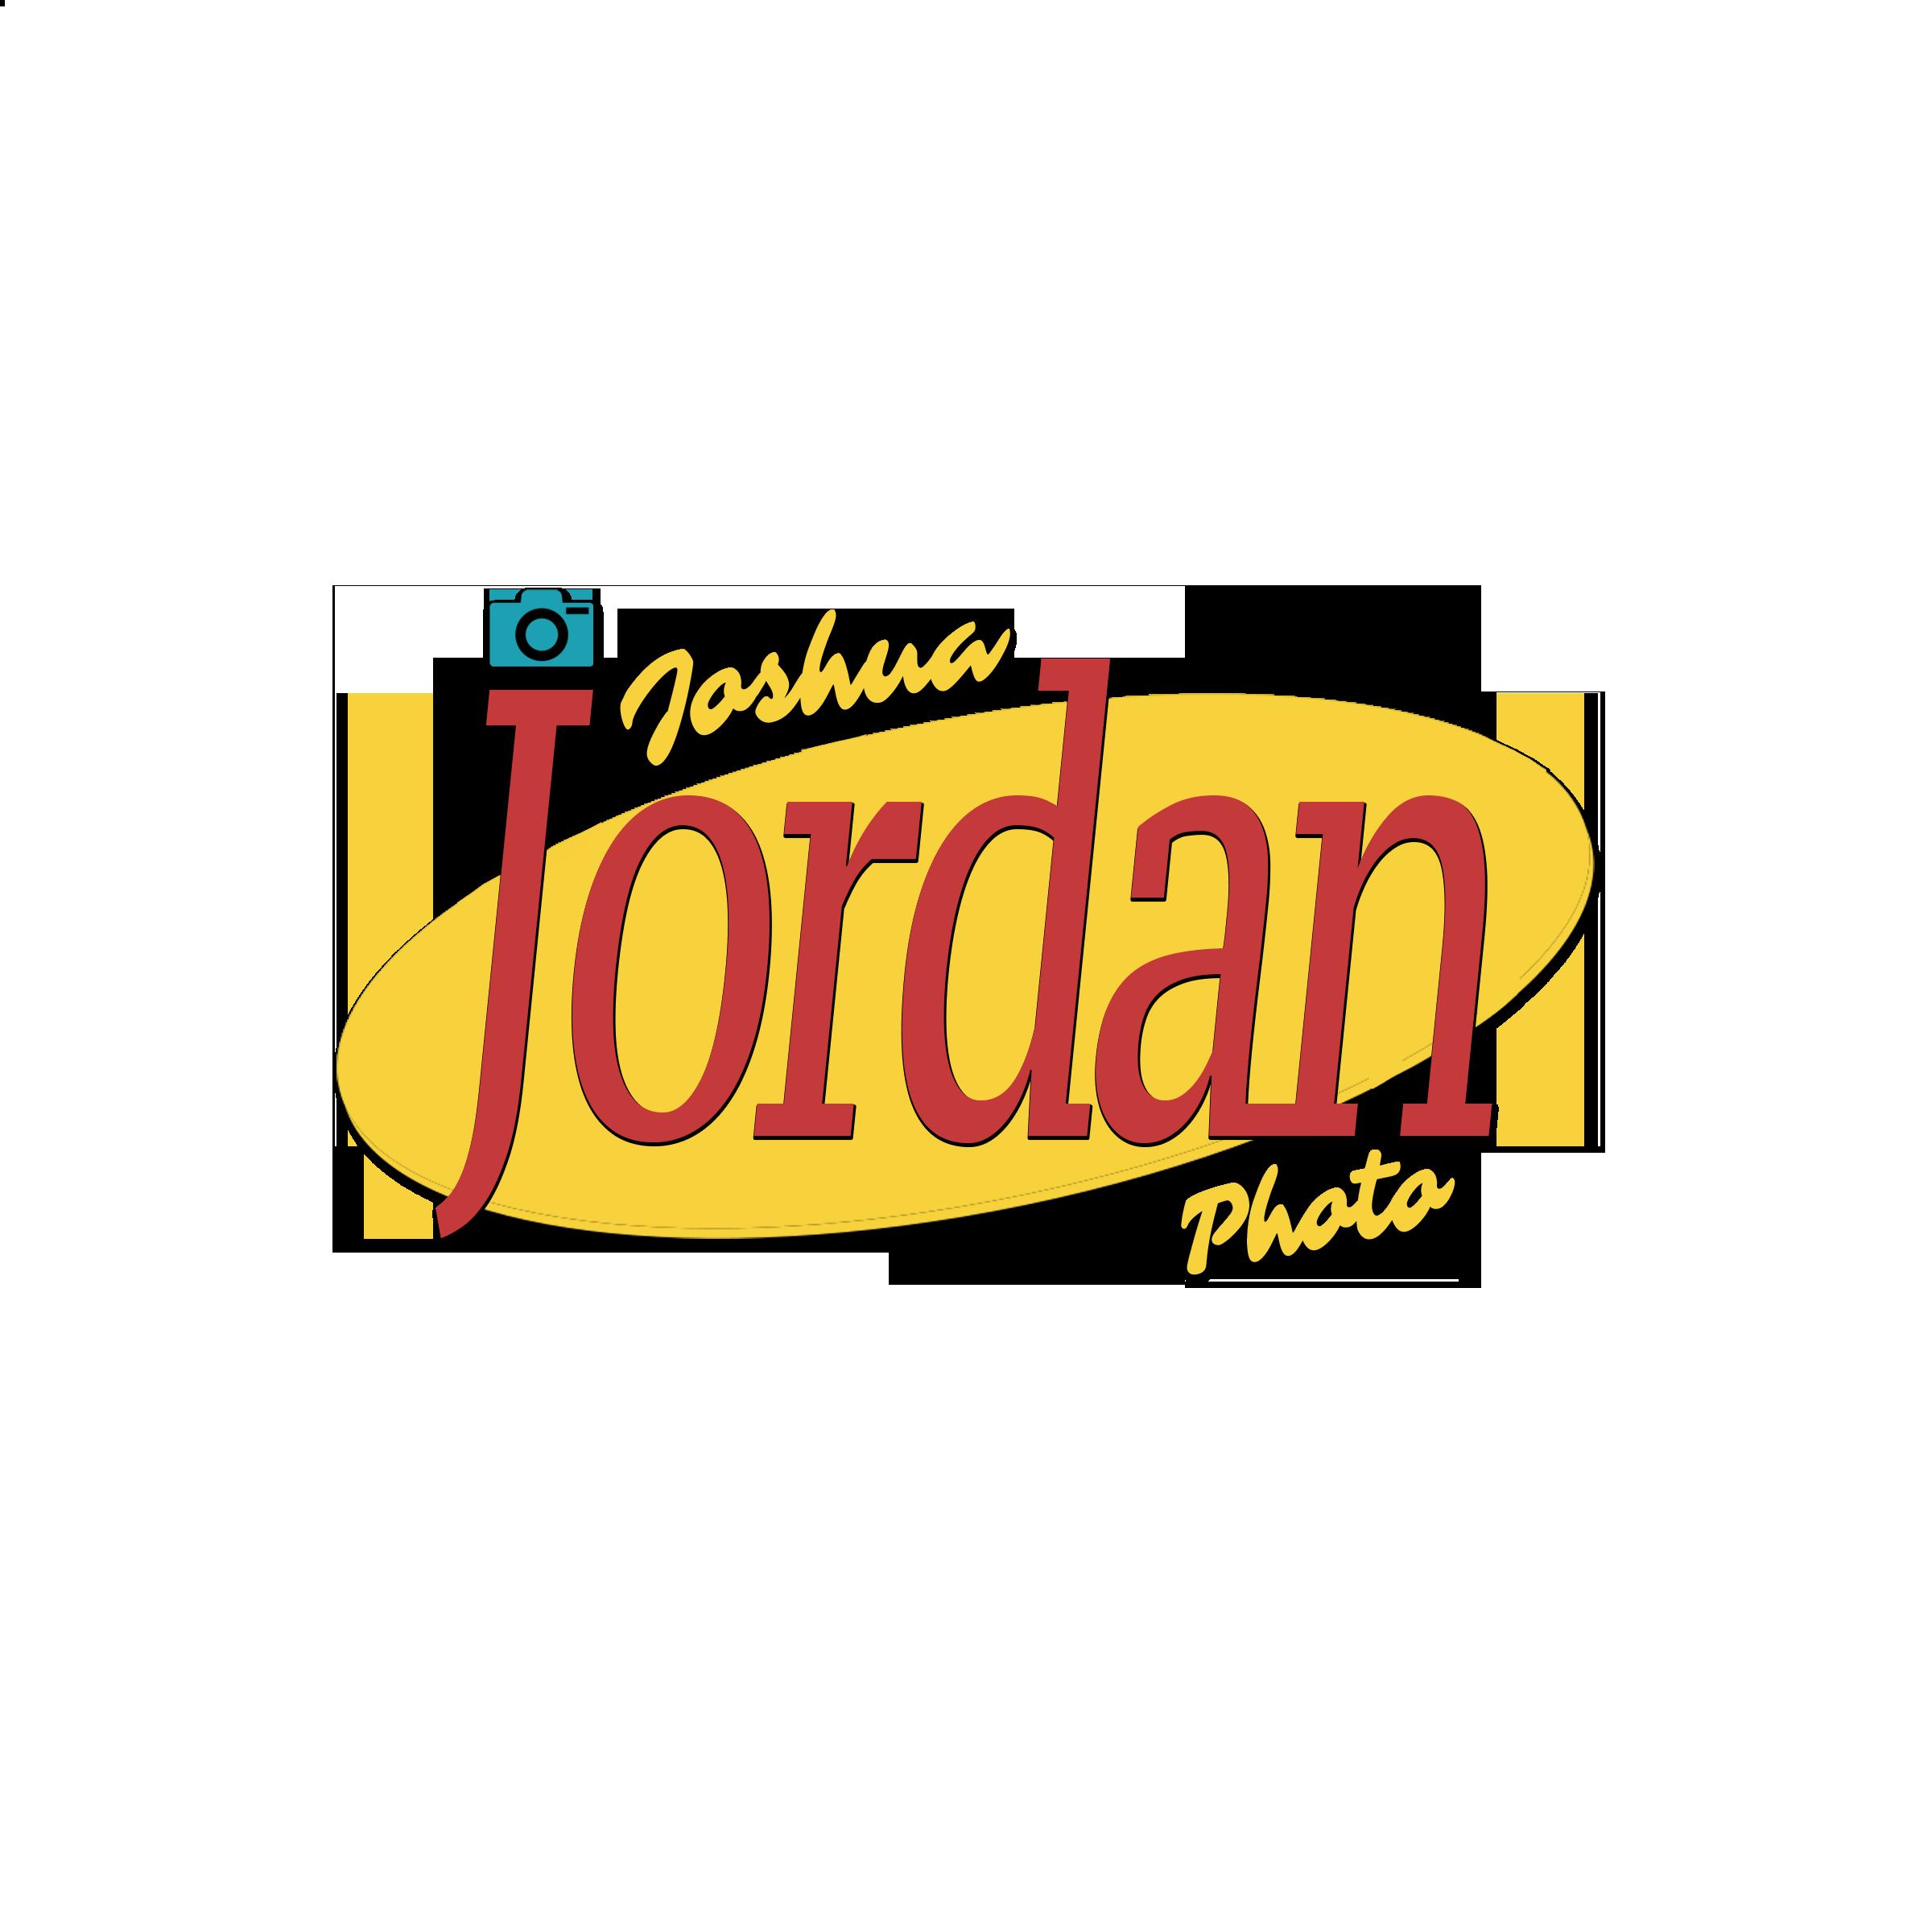 JoshuaJordanPhotoLogo.png